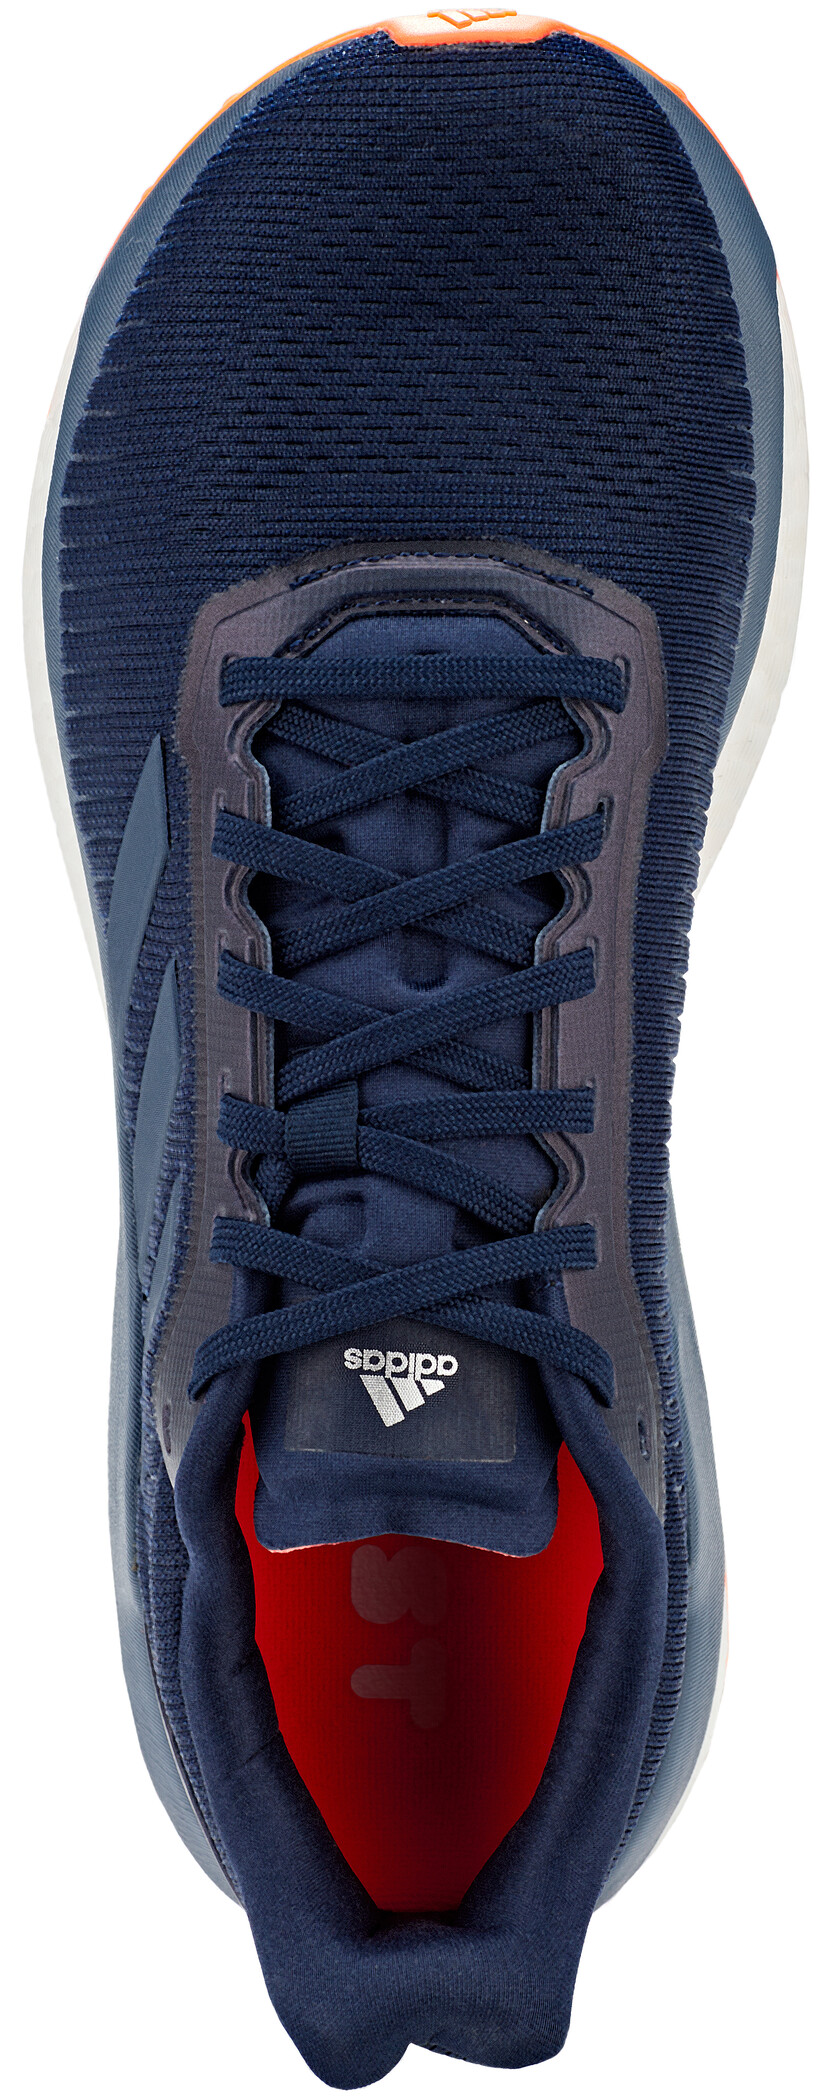 adidas Solar Drive 19 Low Cut Schuhe Herren collegiate navytech inksolar orange